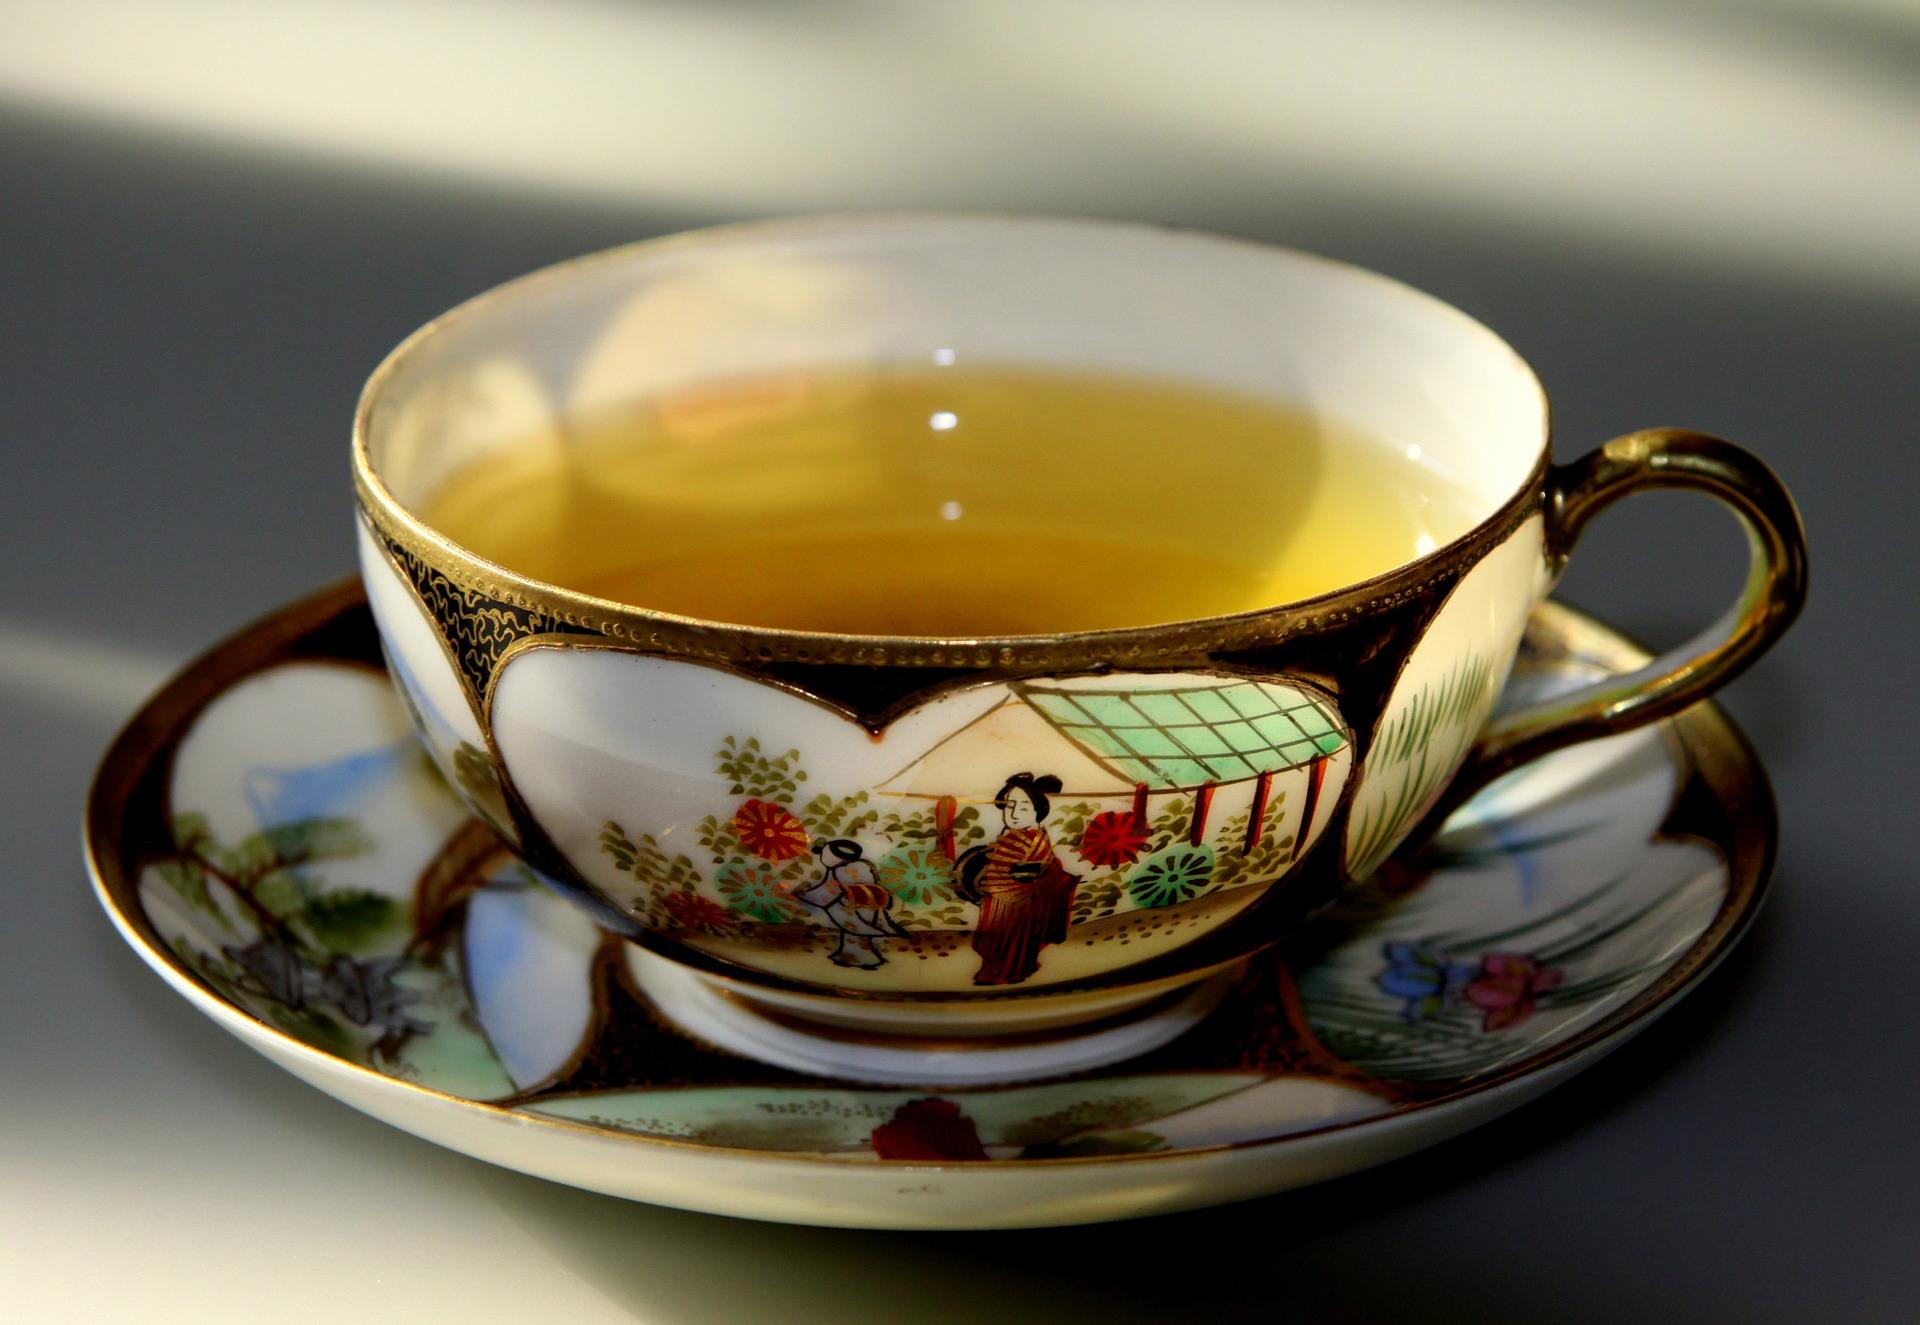 дядя зеленый чай фото чашки онлайн знакомства